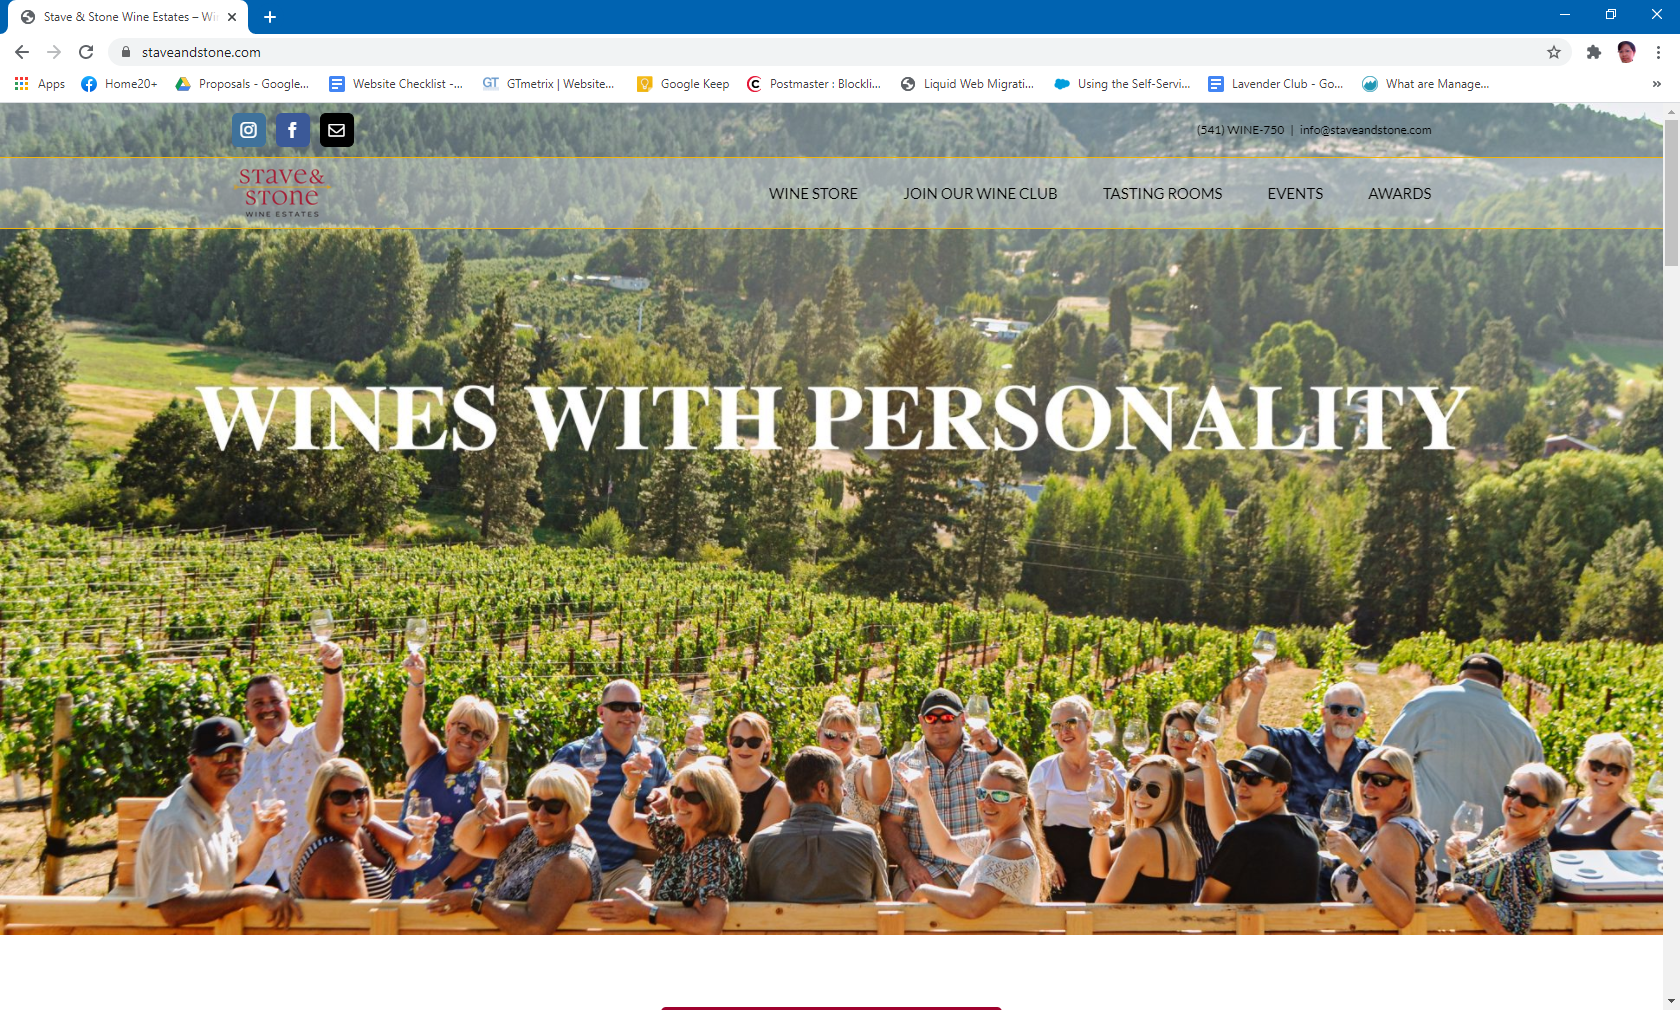 Stave and Stone Wine Estates